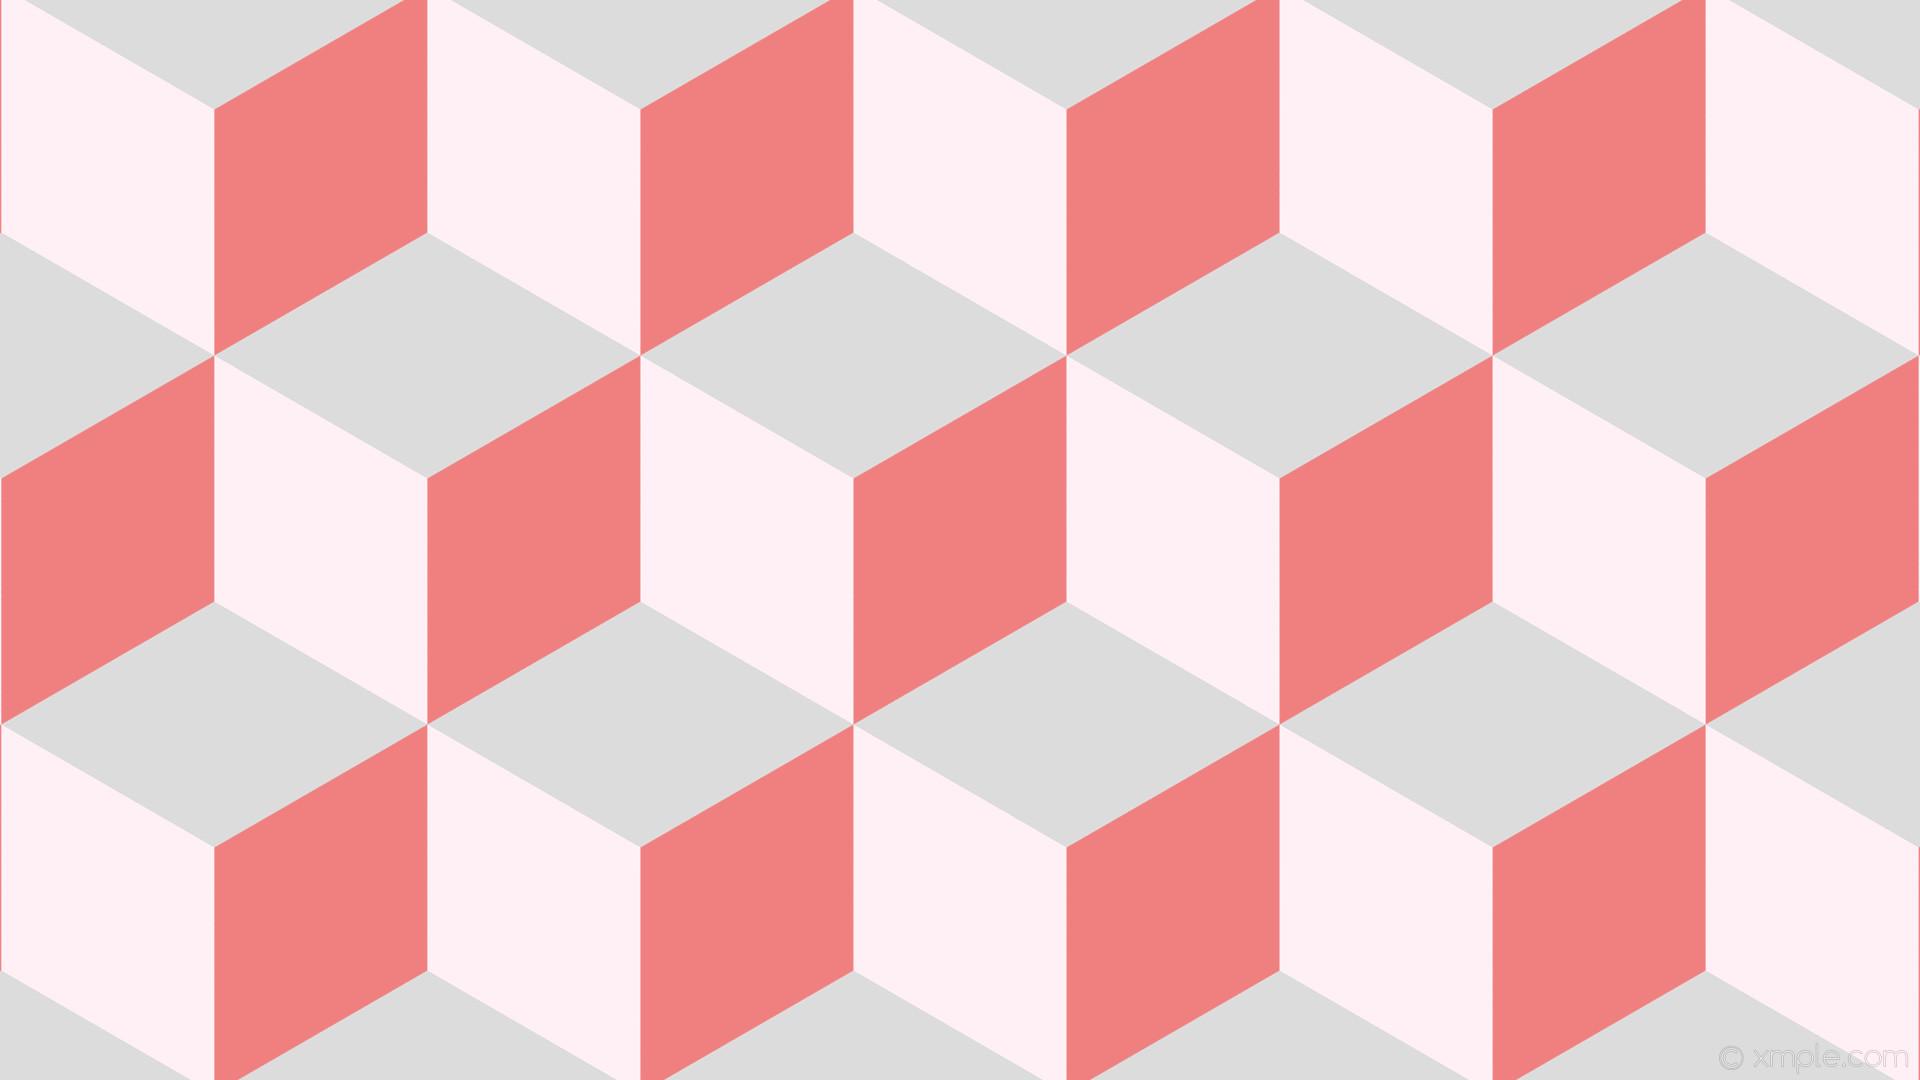 wallpaper grey 3d cubes white red light coral gainsboro lavender blush  #f08080 #dcdcdc #